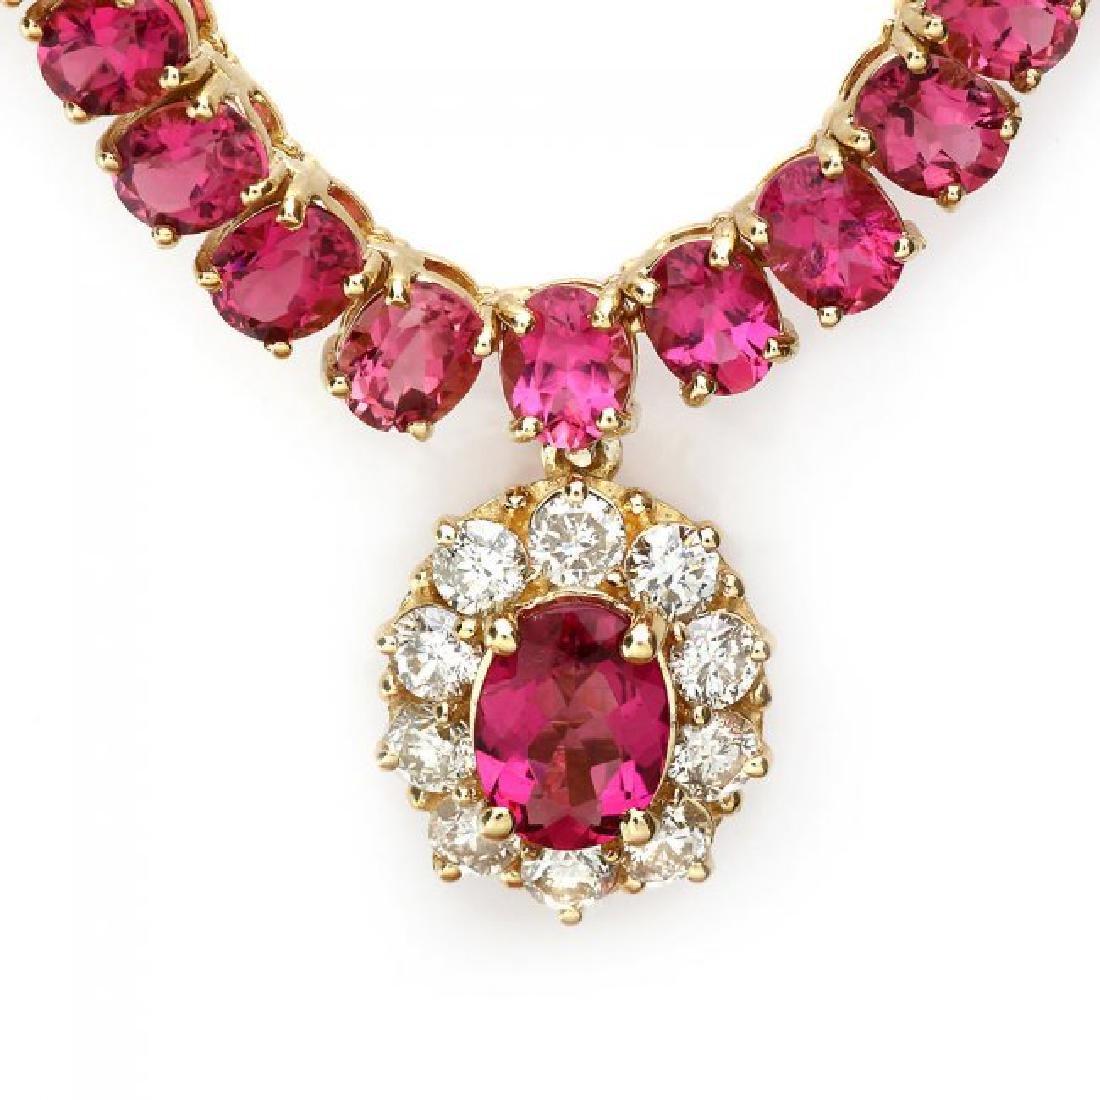 14k Gold 40ct Tourmaline 1ct Diamond Necklace - 7